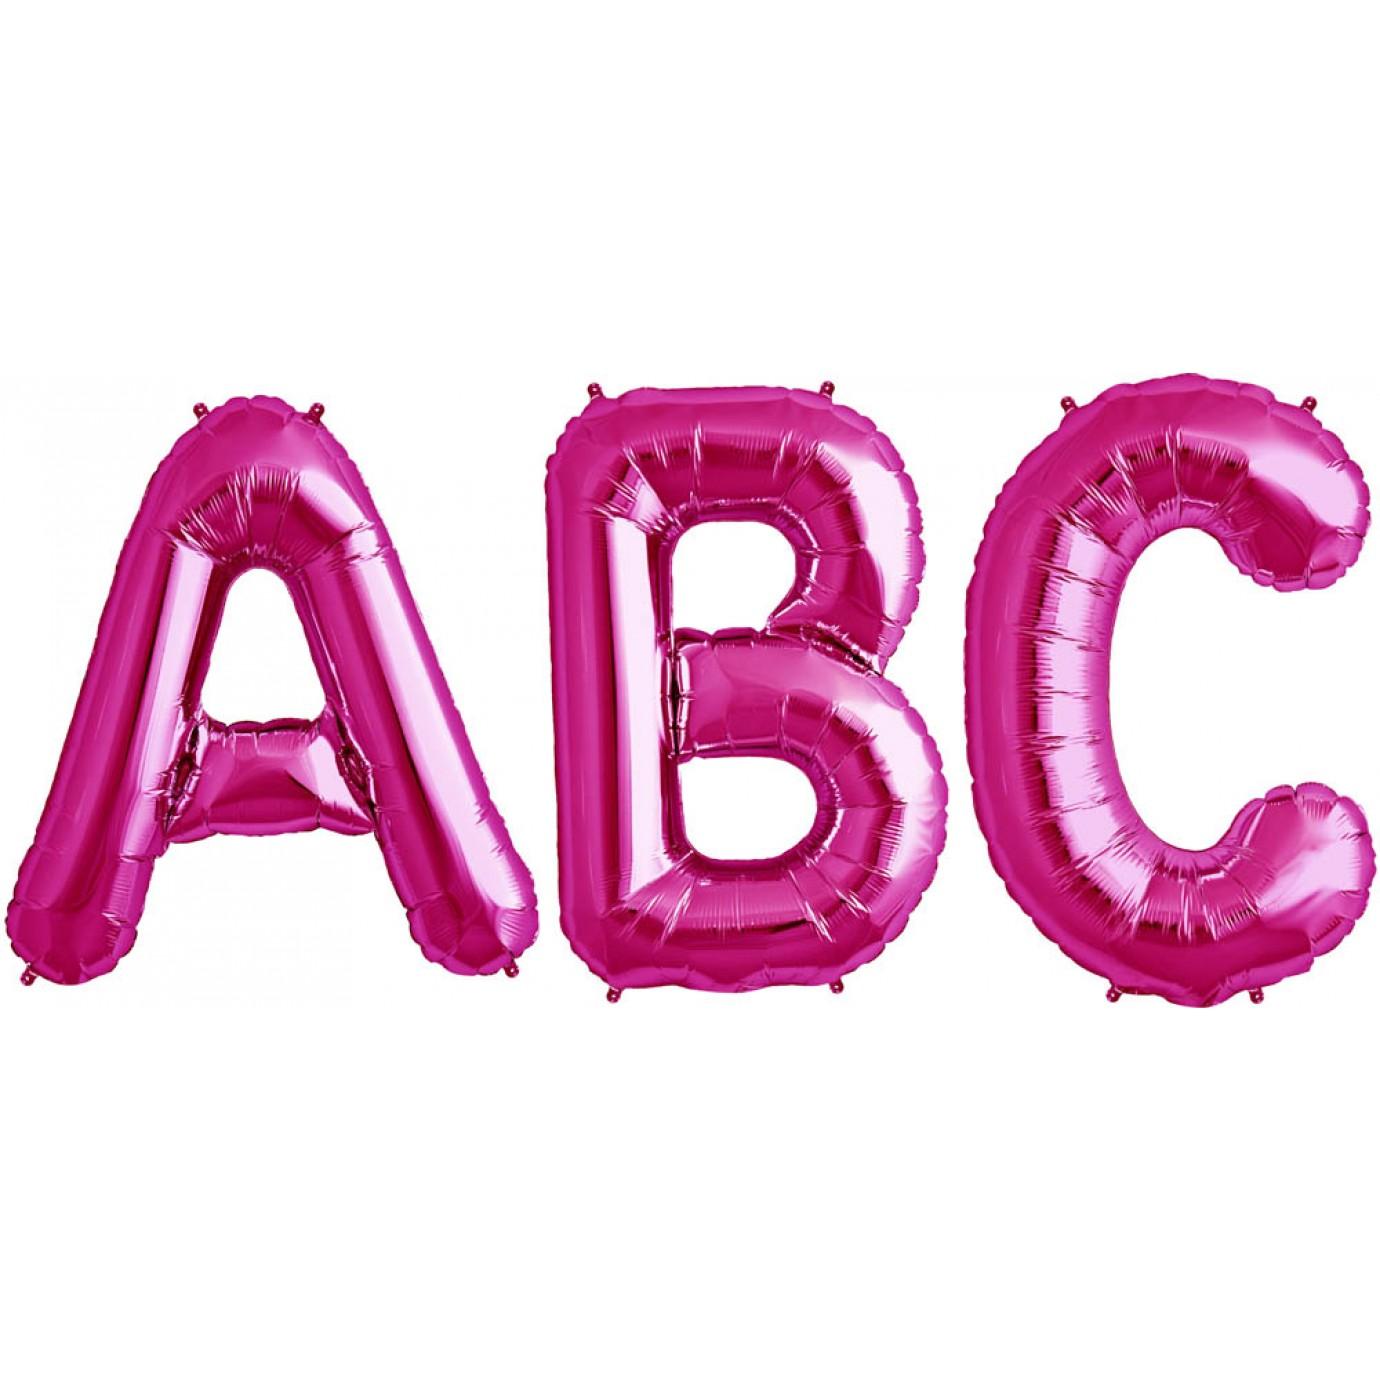 Balloon foil letter large magenta foil balloons for Large foil letter balloons